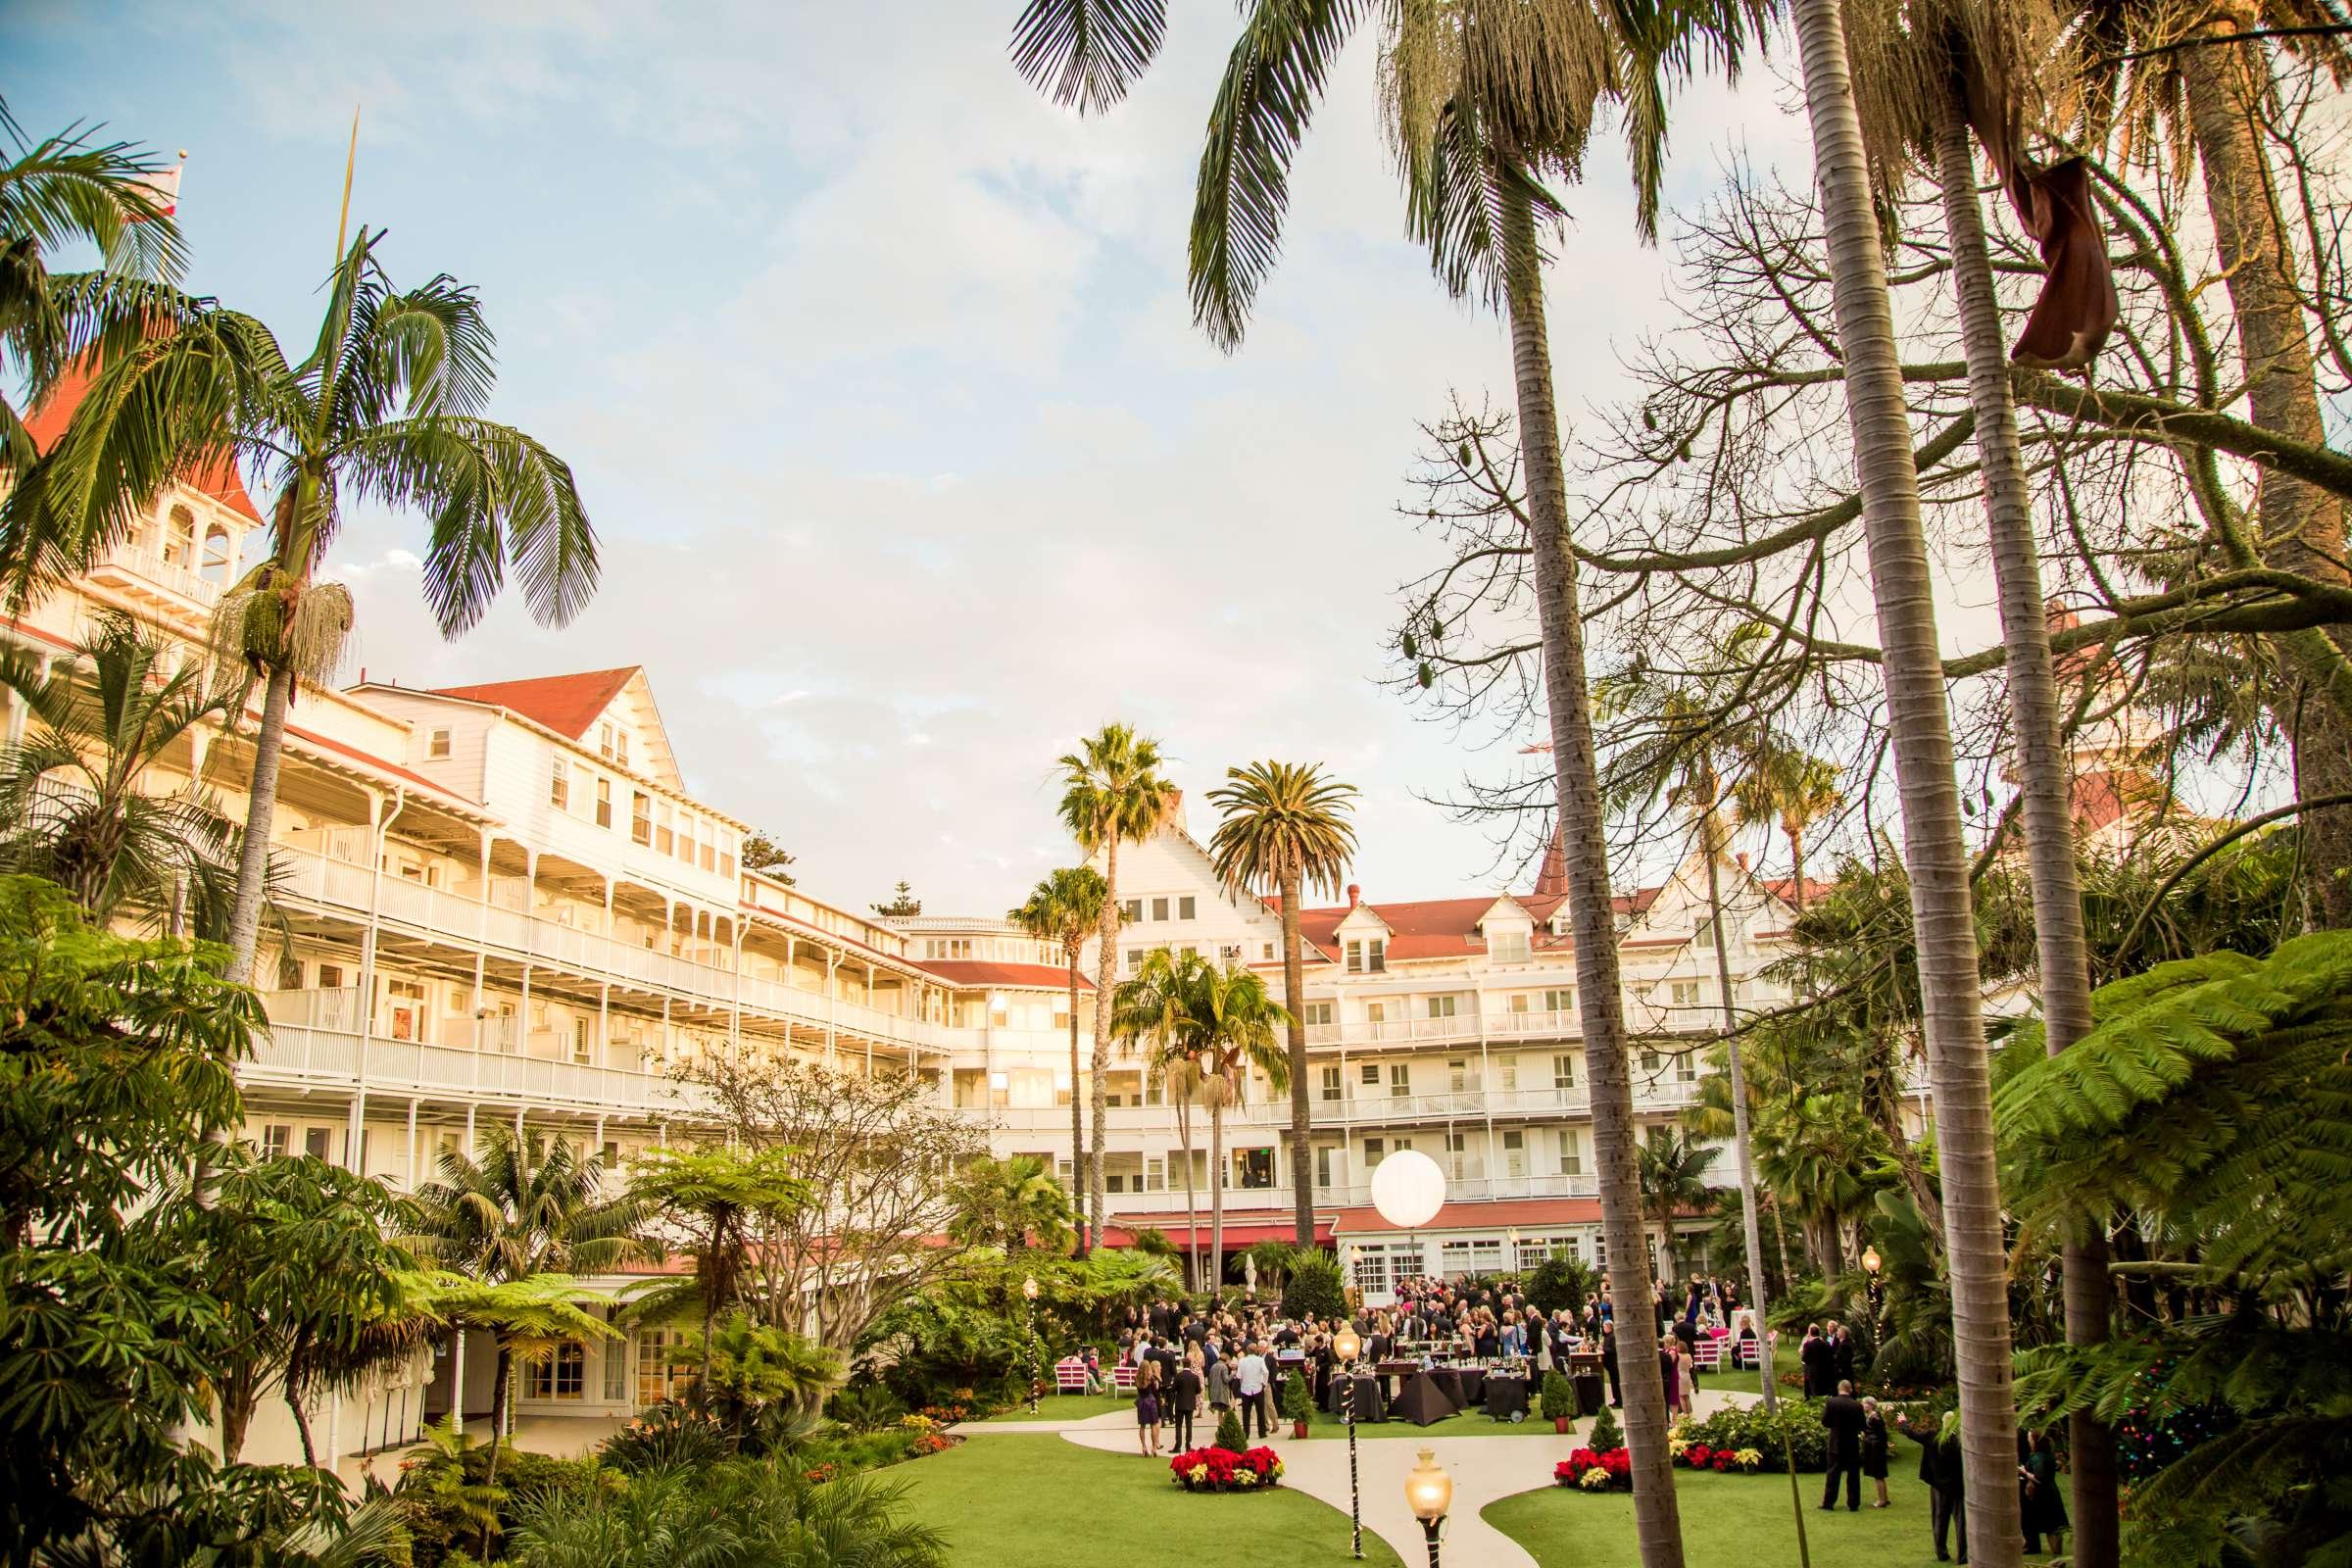 Hotel Del Coronado | San Diego Photographer - True Photography